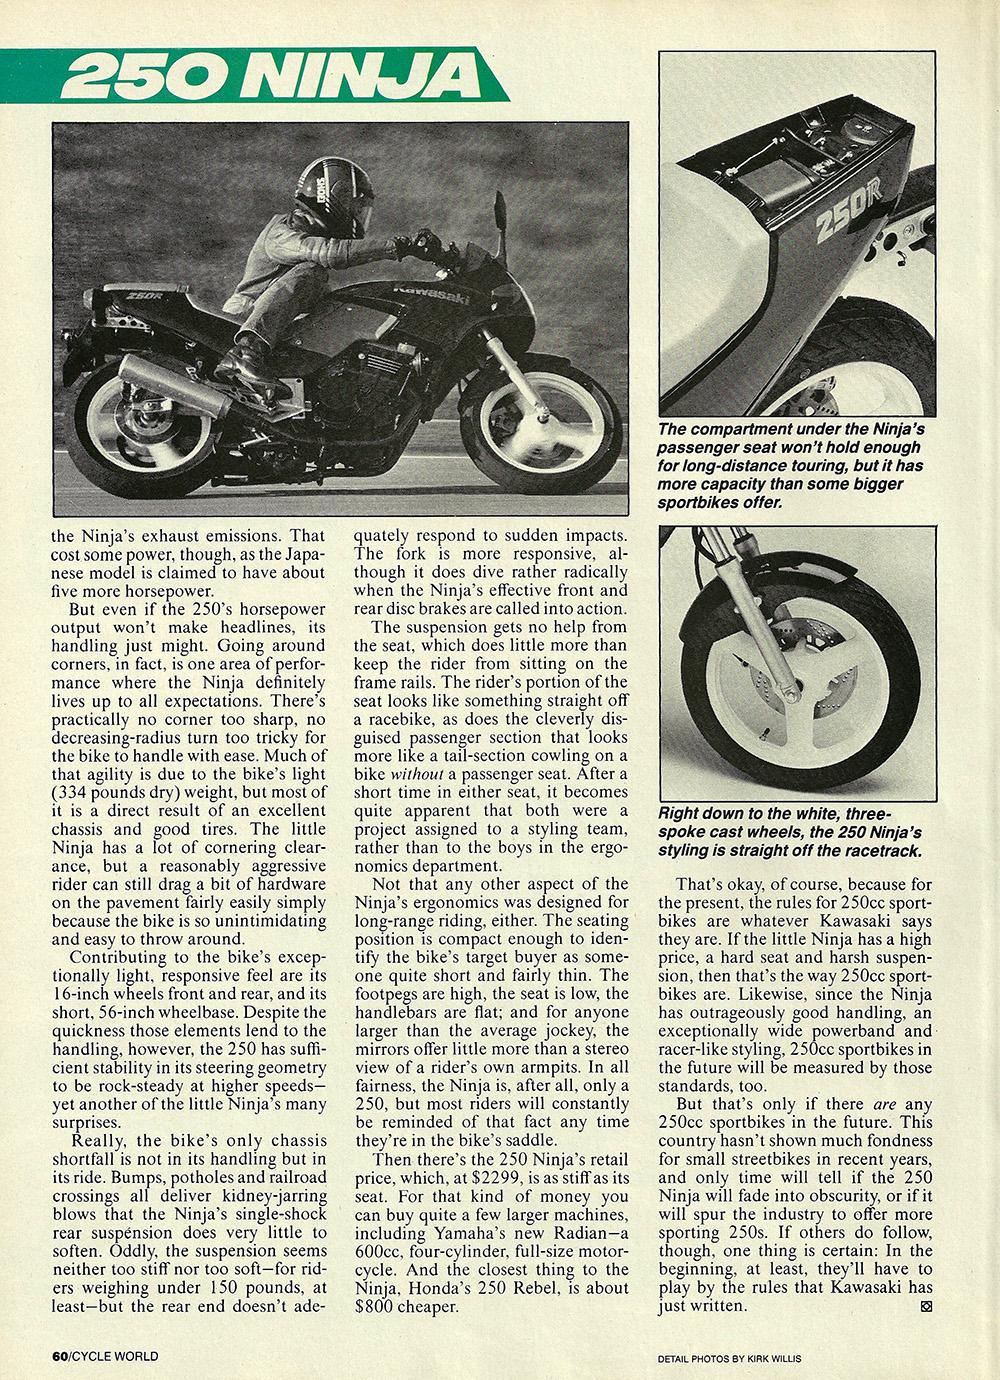 1986 Kawasaki Ninja 250 road test 03.jpg